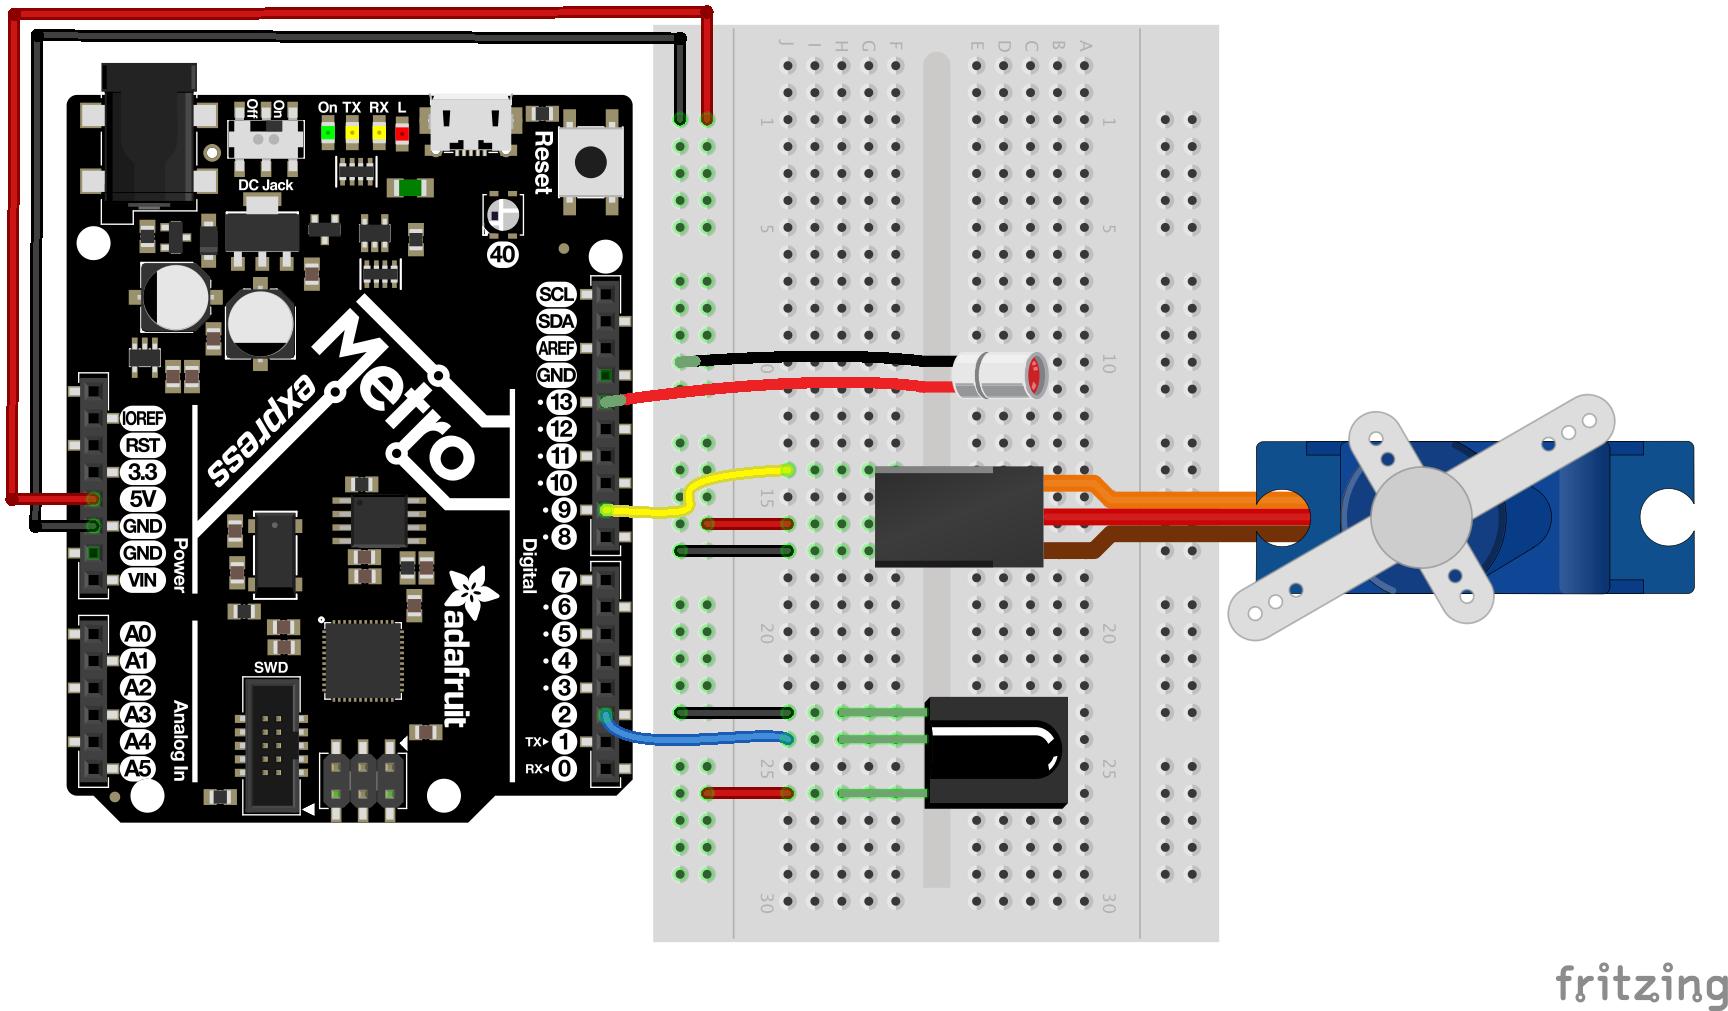 sensors_adafruit_products_PROJ06_bb-OPT.png